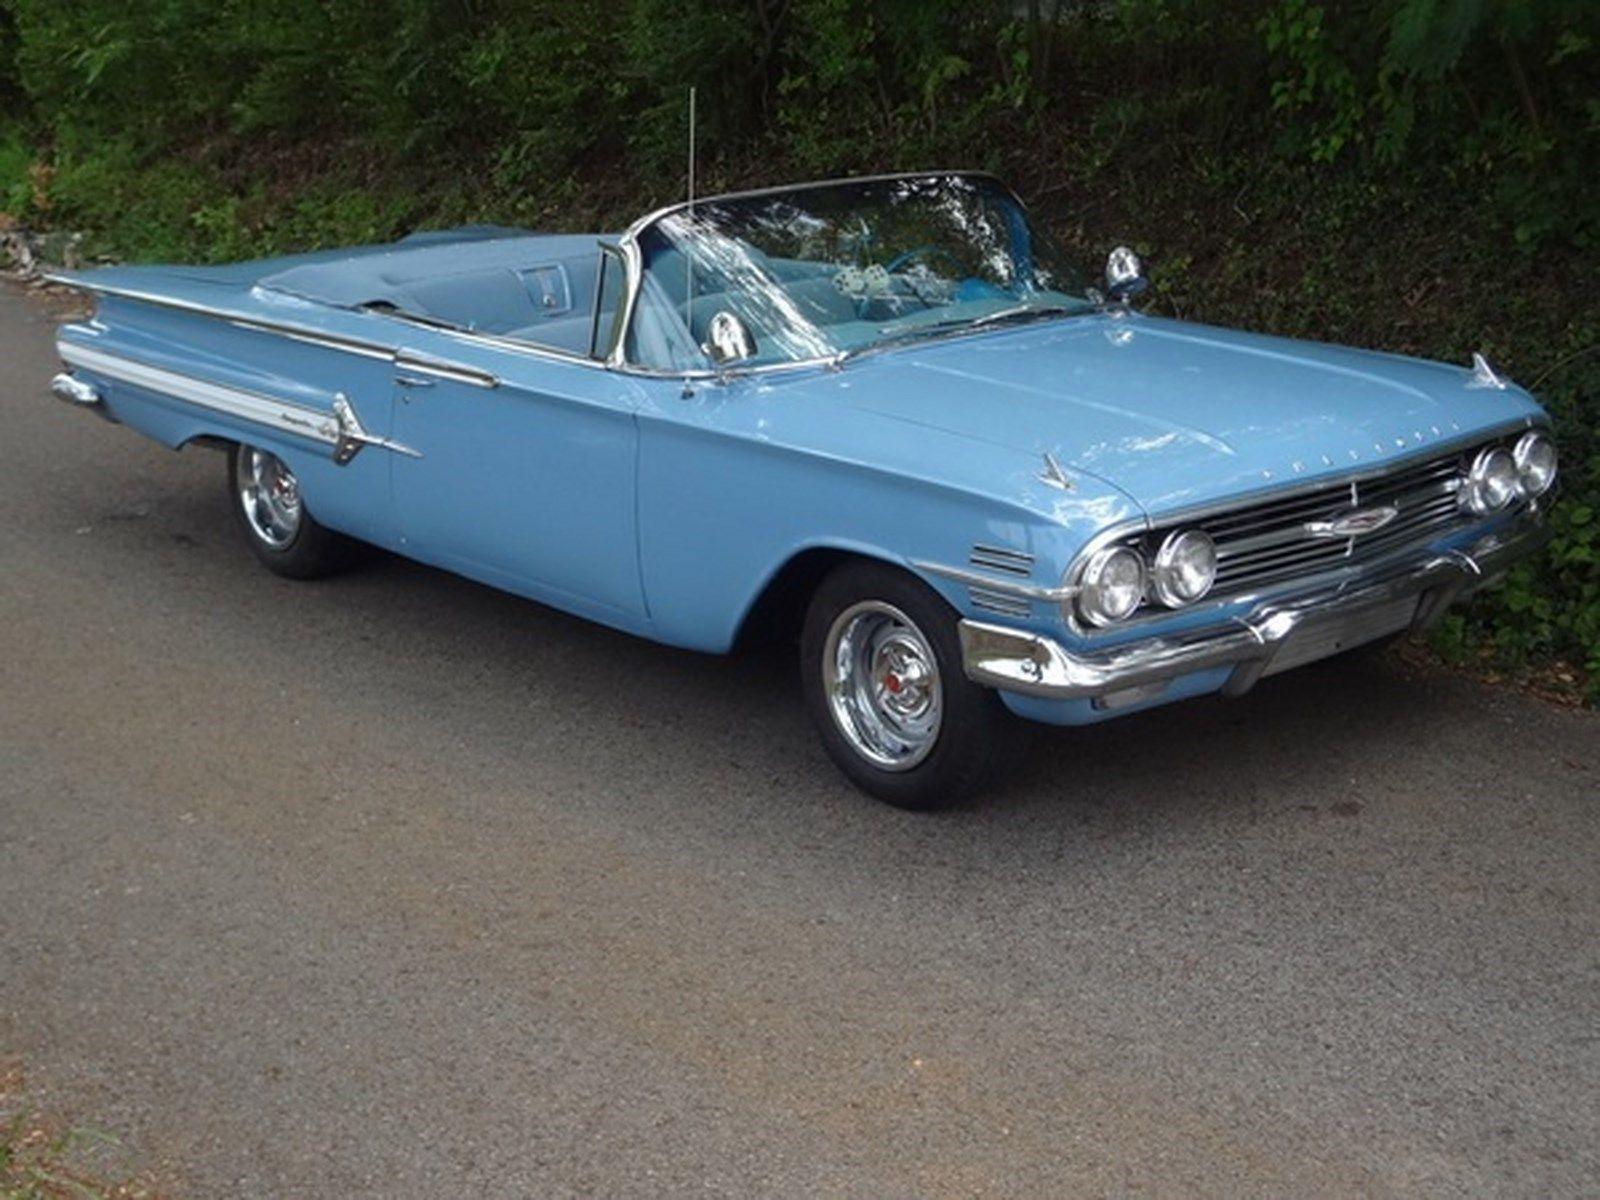 1960 Chevy Impala Ss Convertible